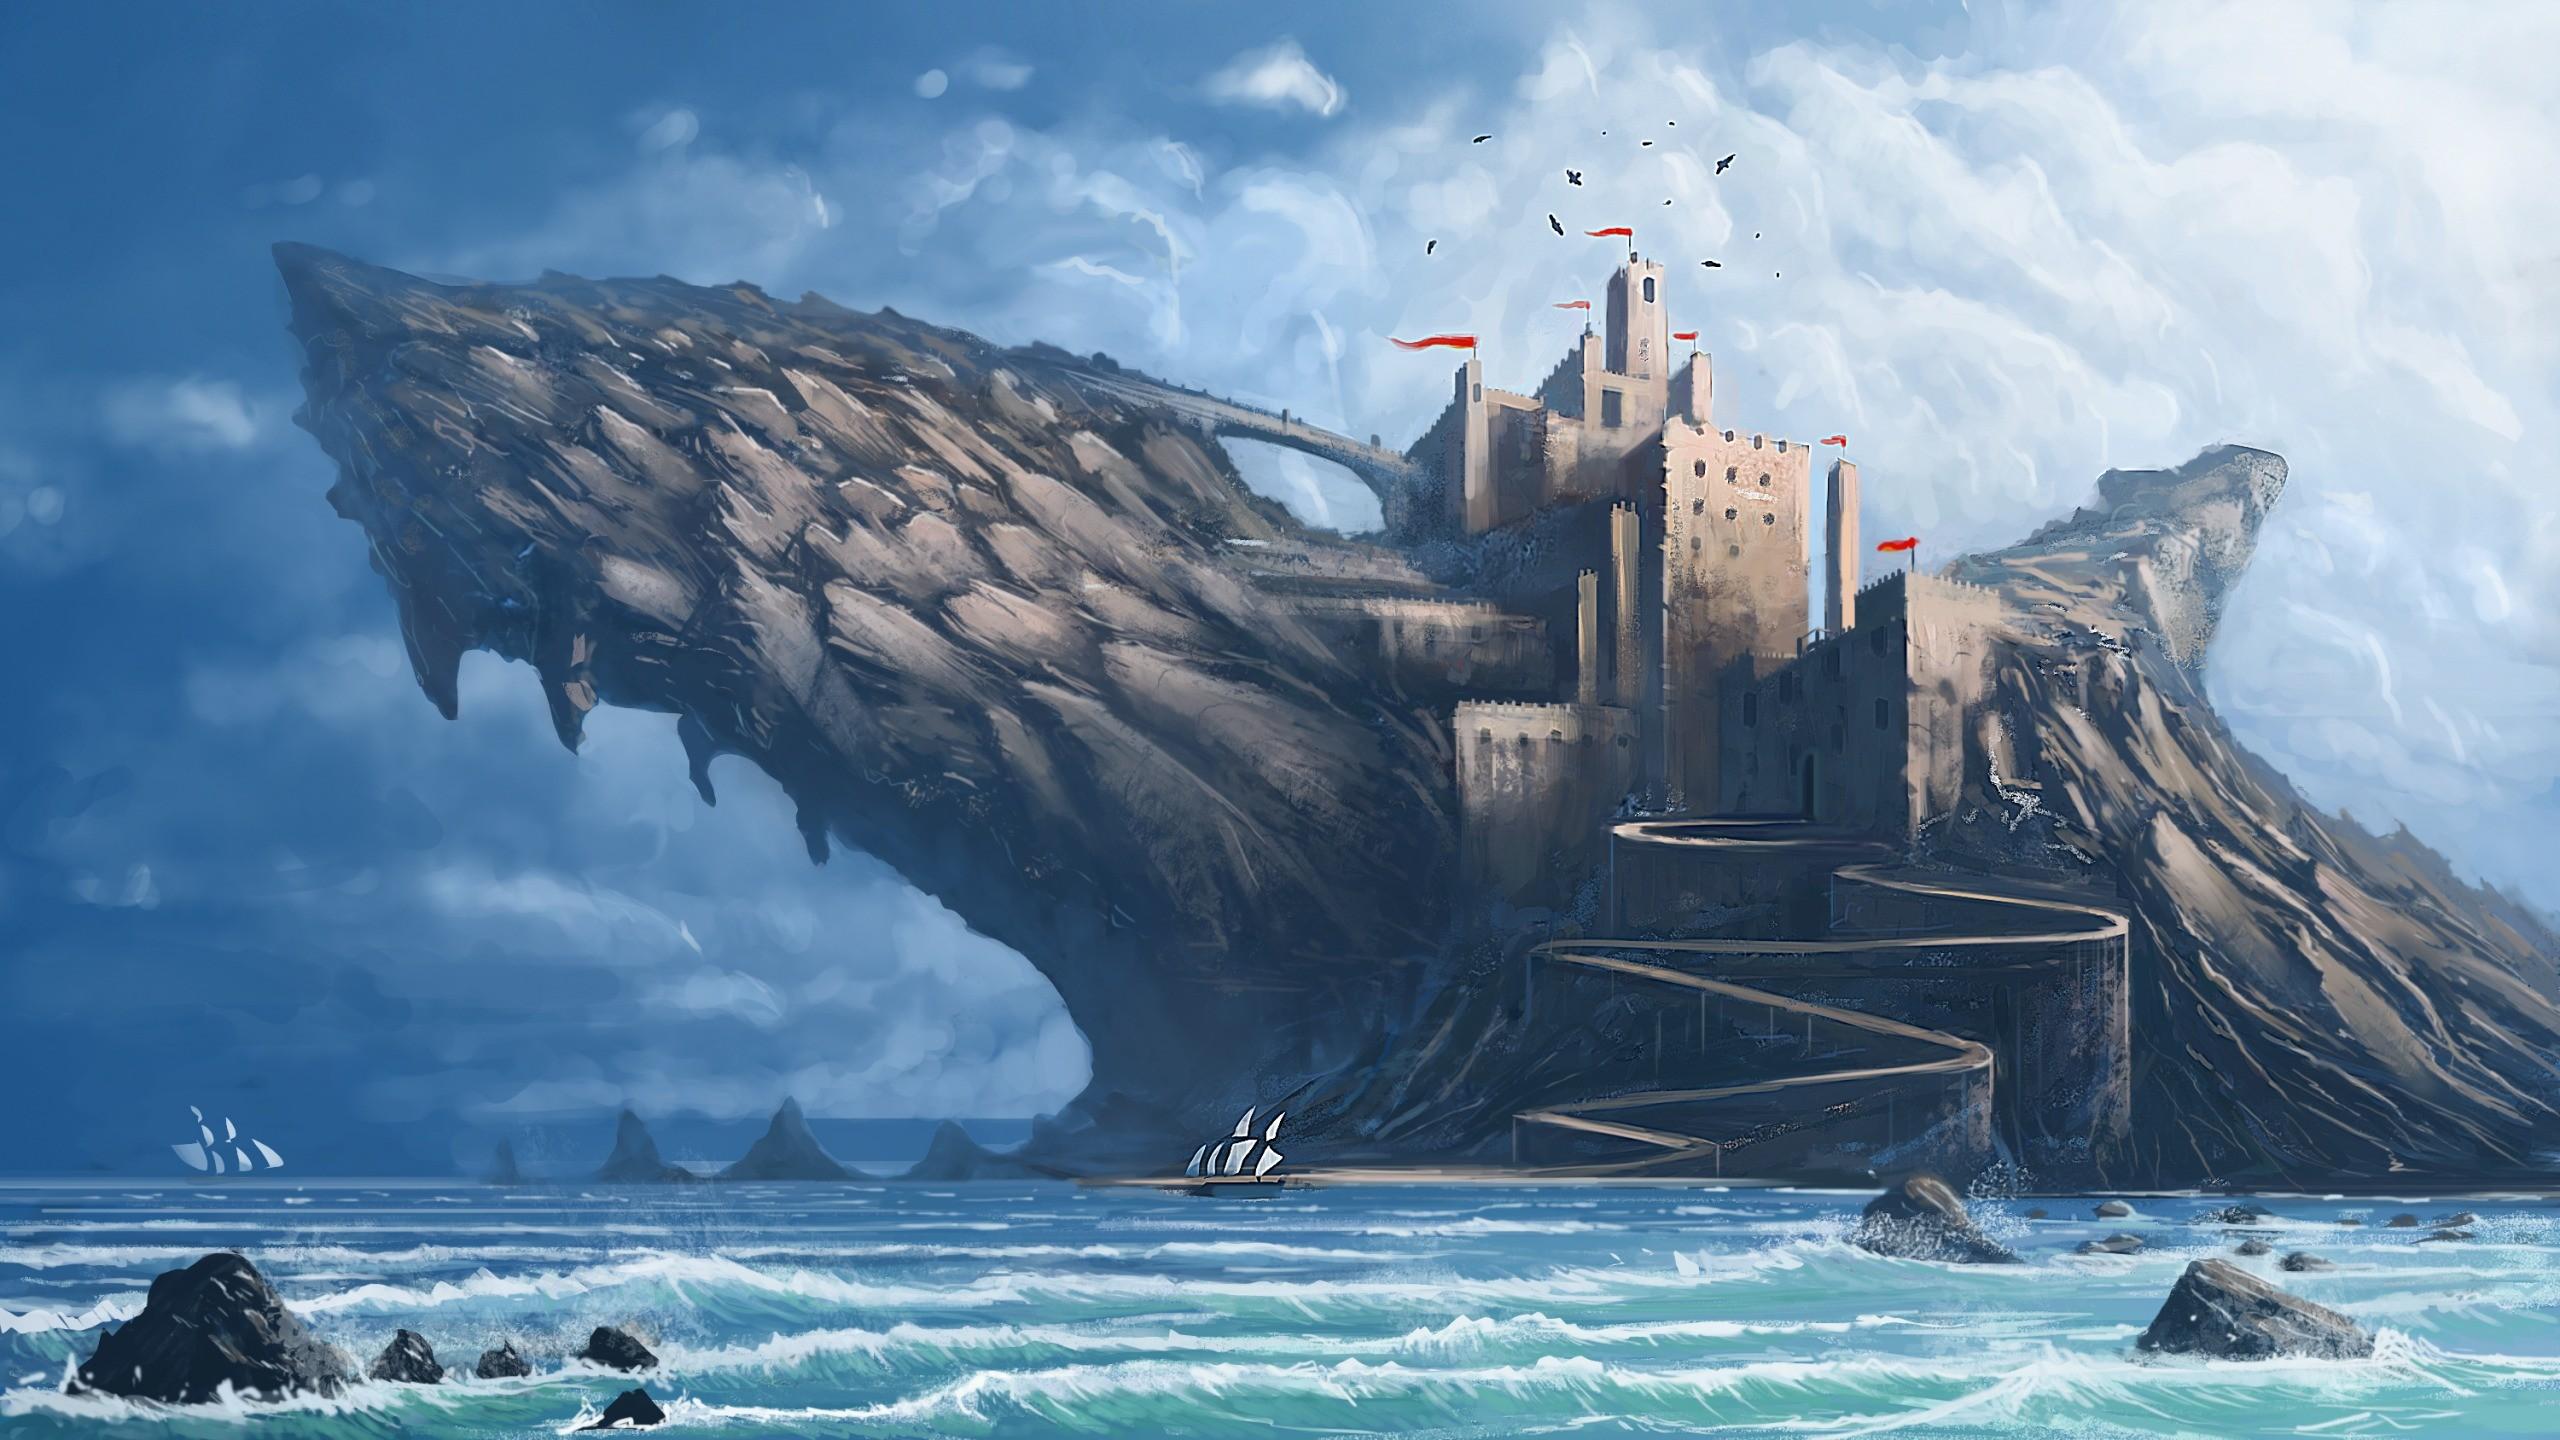 General 2560x1440 digital art fantasy art nature landscape water rock castle shark sea waves sailing ship flag clouds tower birds fangs fin painting DeviantArt